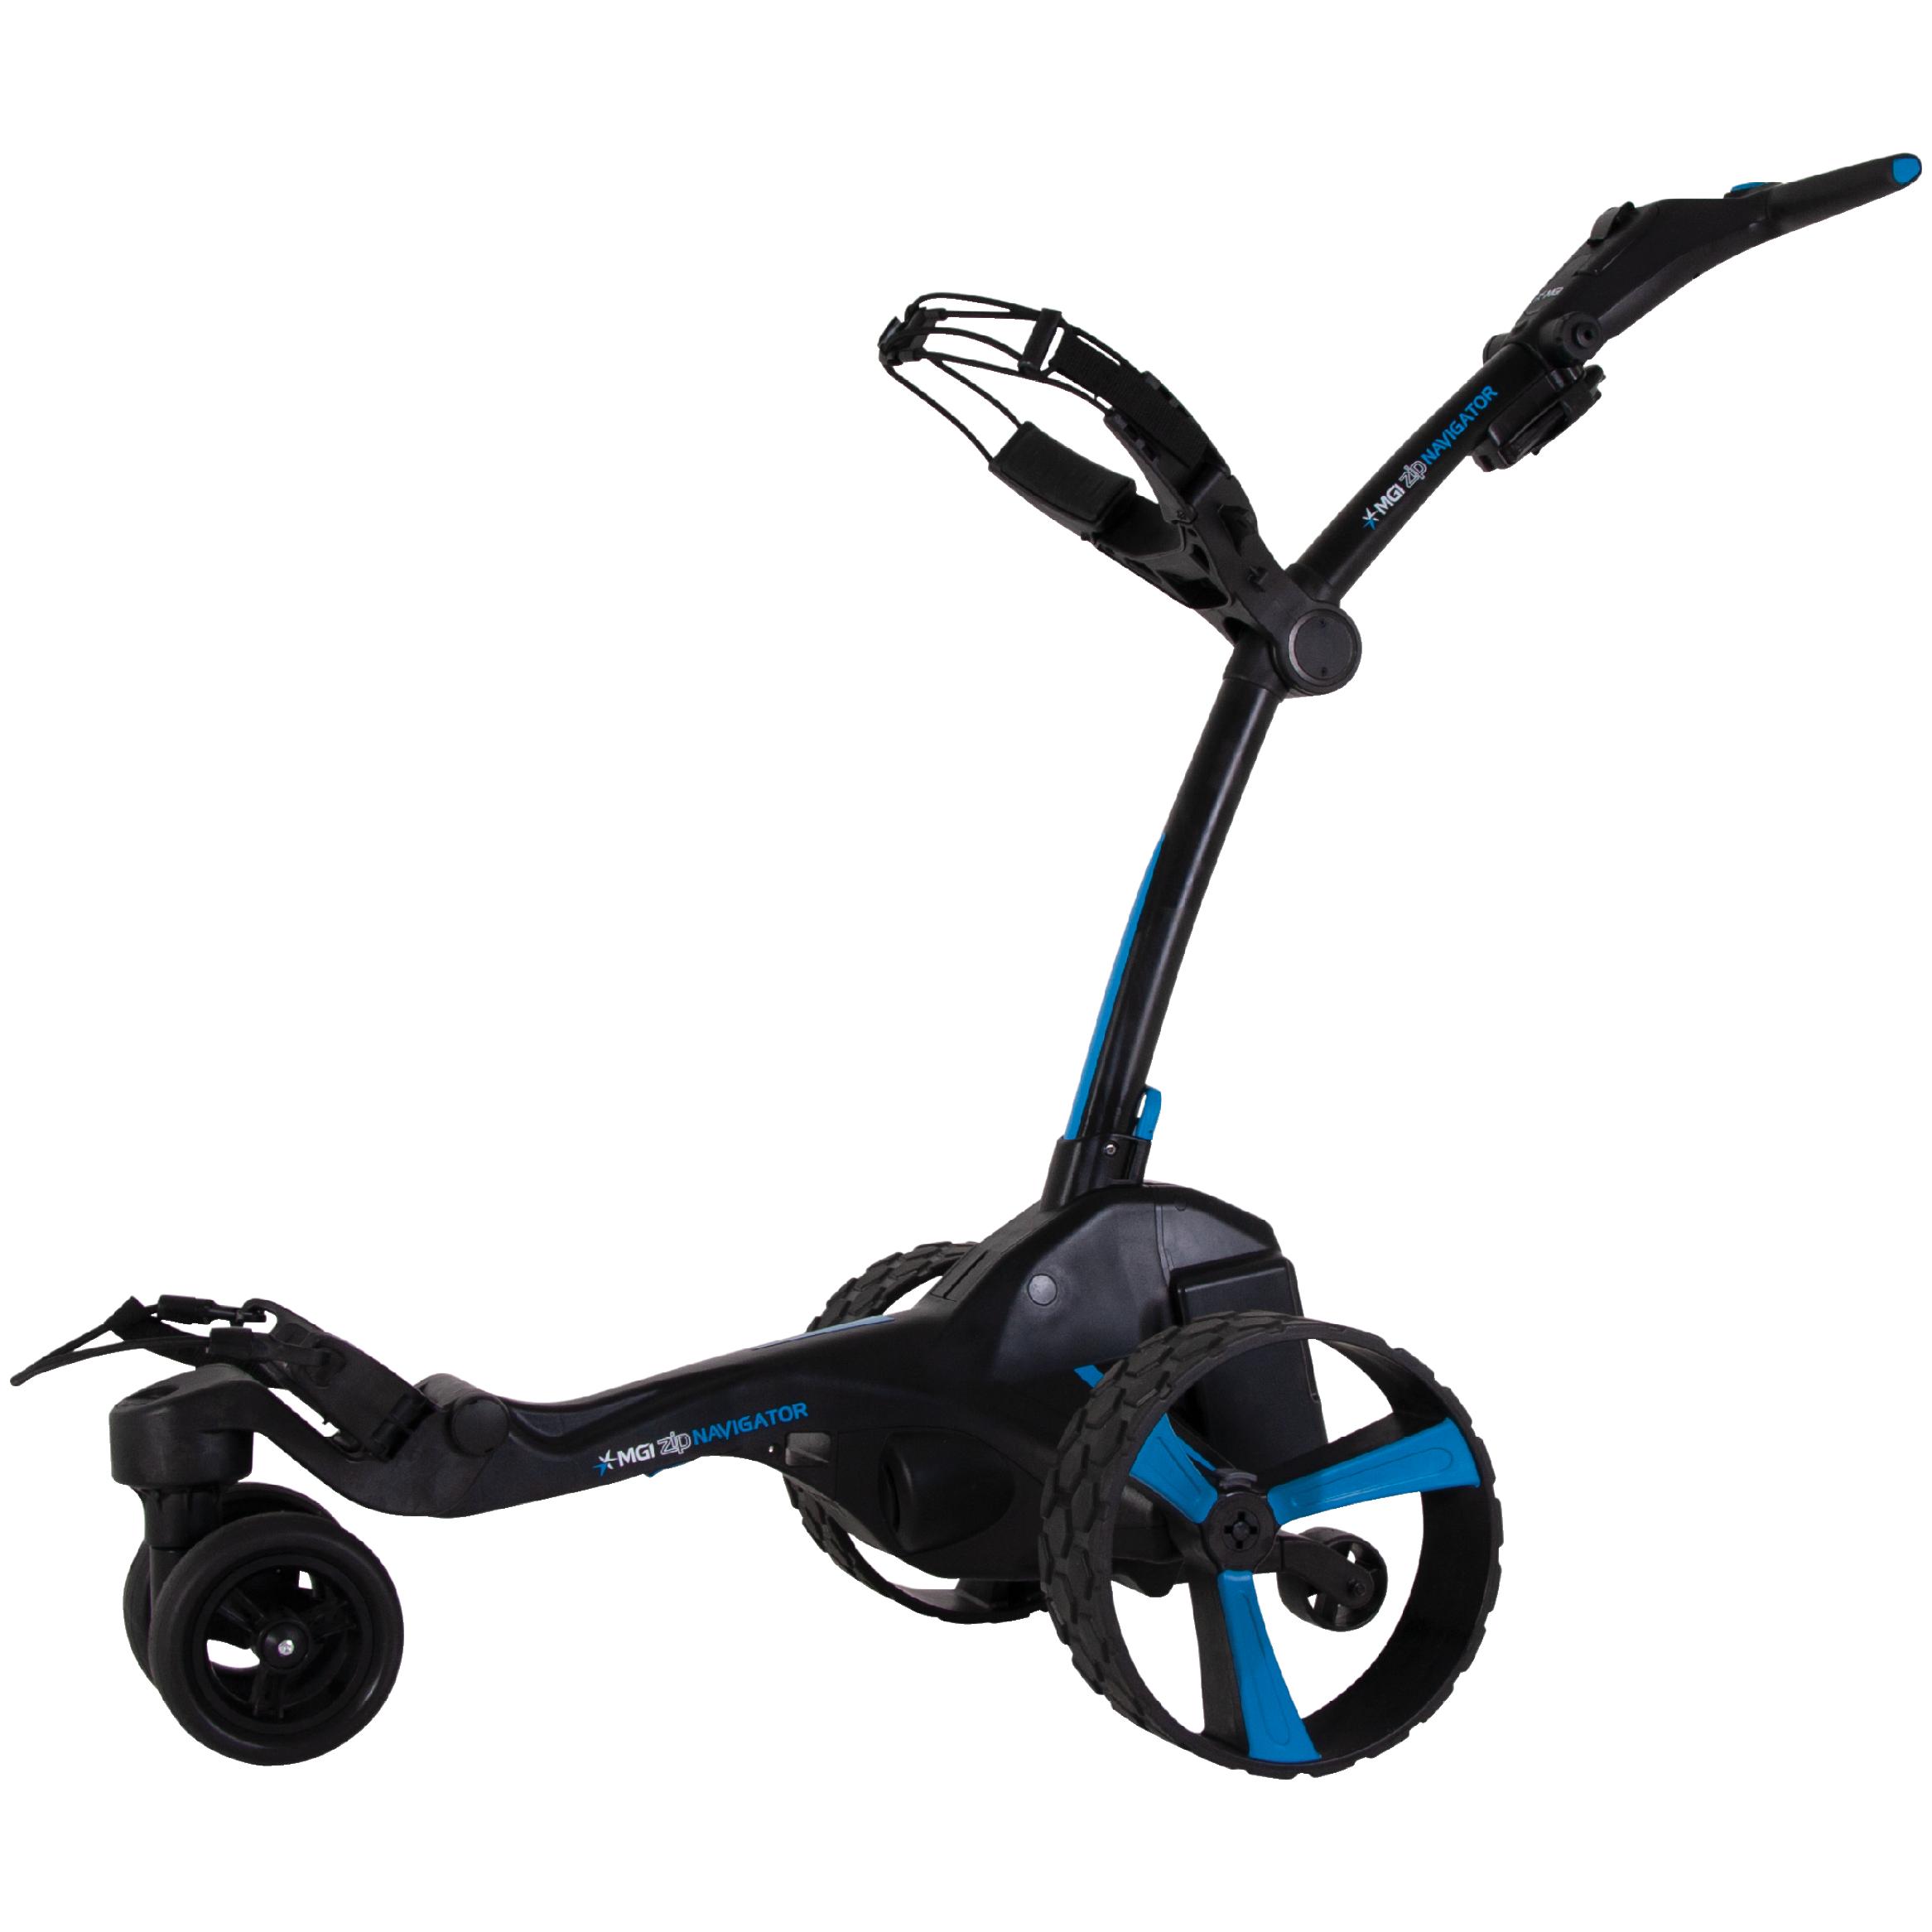 Mgi Zip Navigator Lithium Battery Electric Golf Push Cart